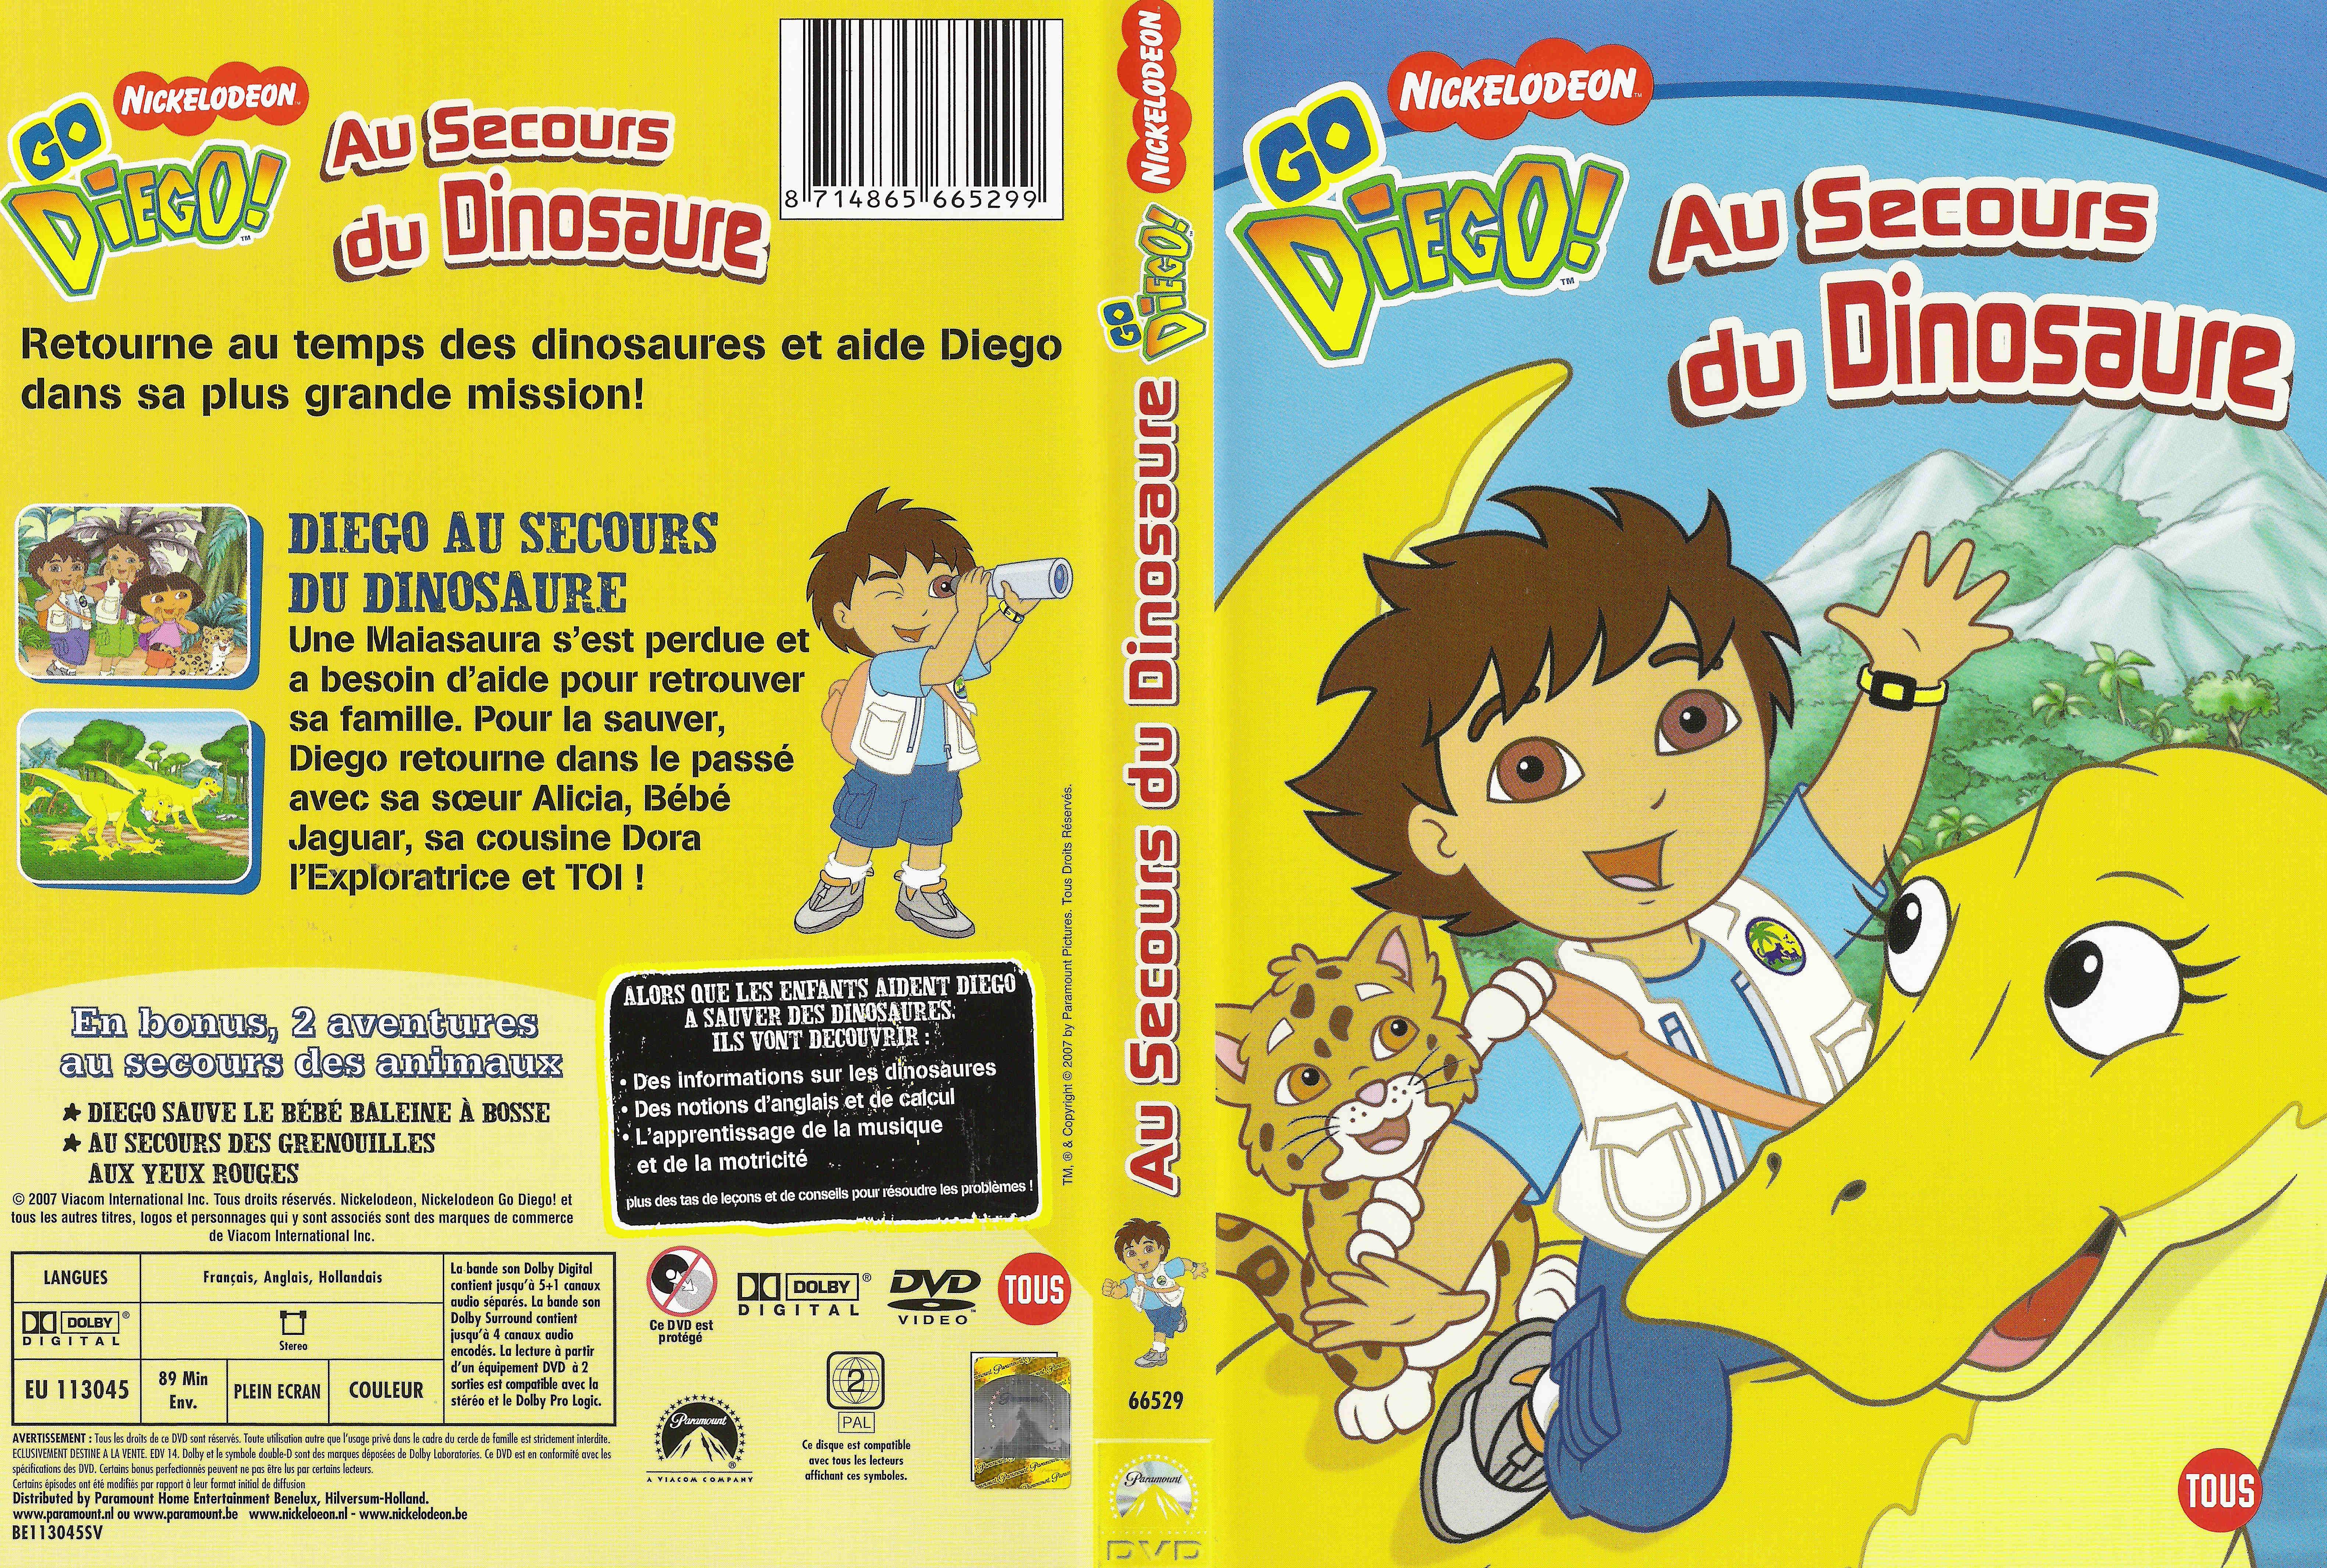 Go diego : Au secours du dinosaure Covers